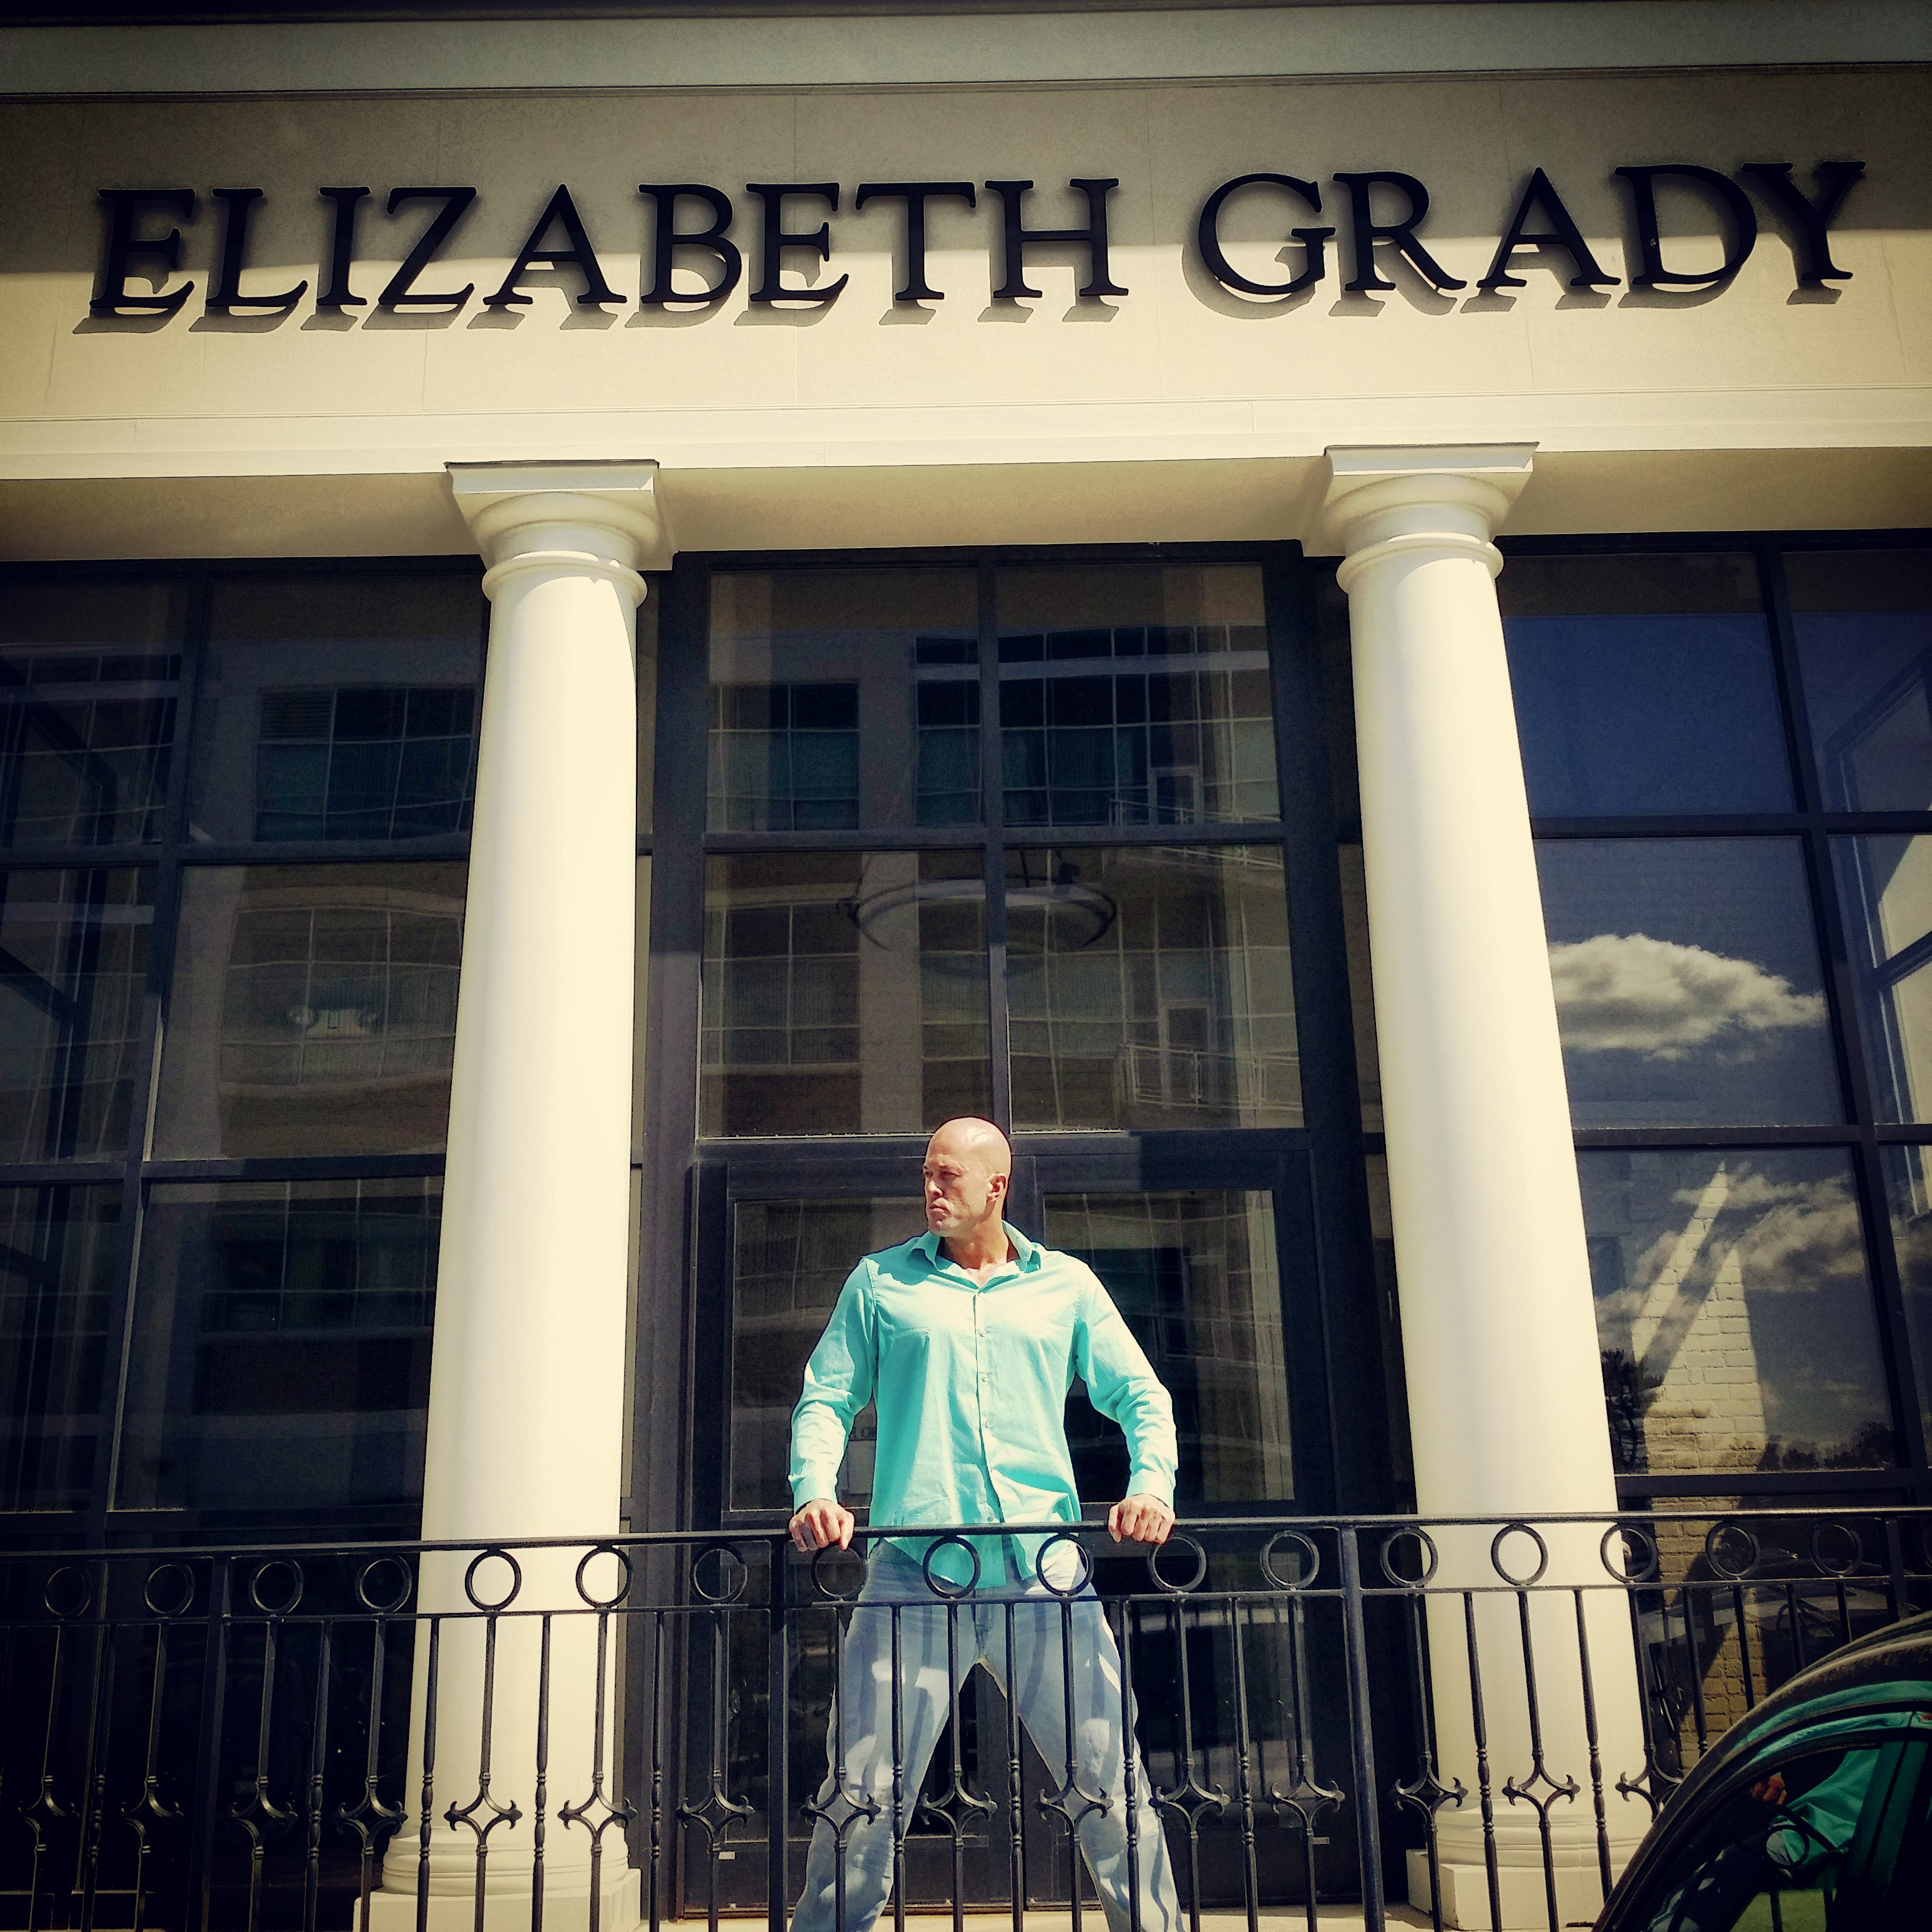 Model John Quinlan for Elizabeth Grady Company